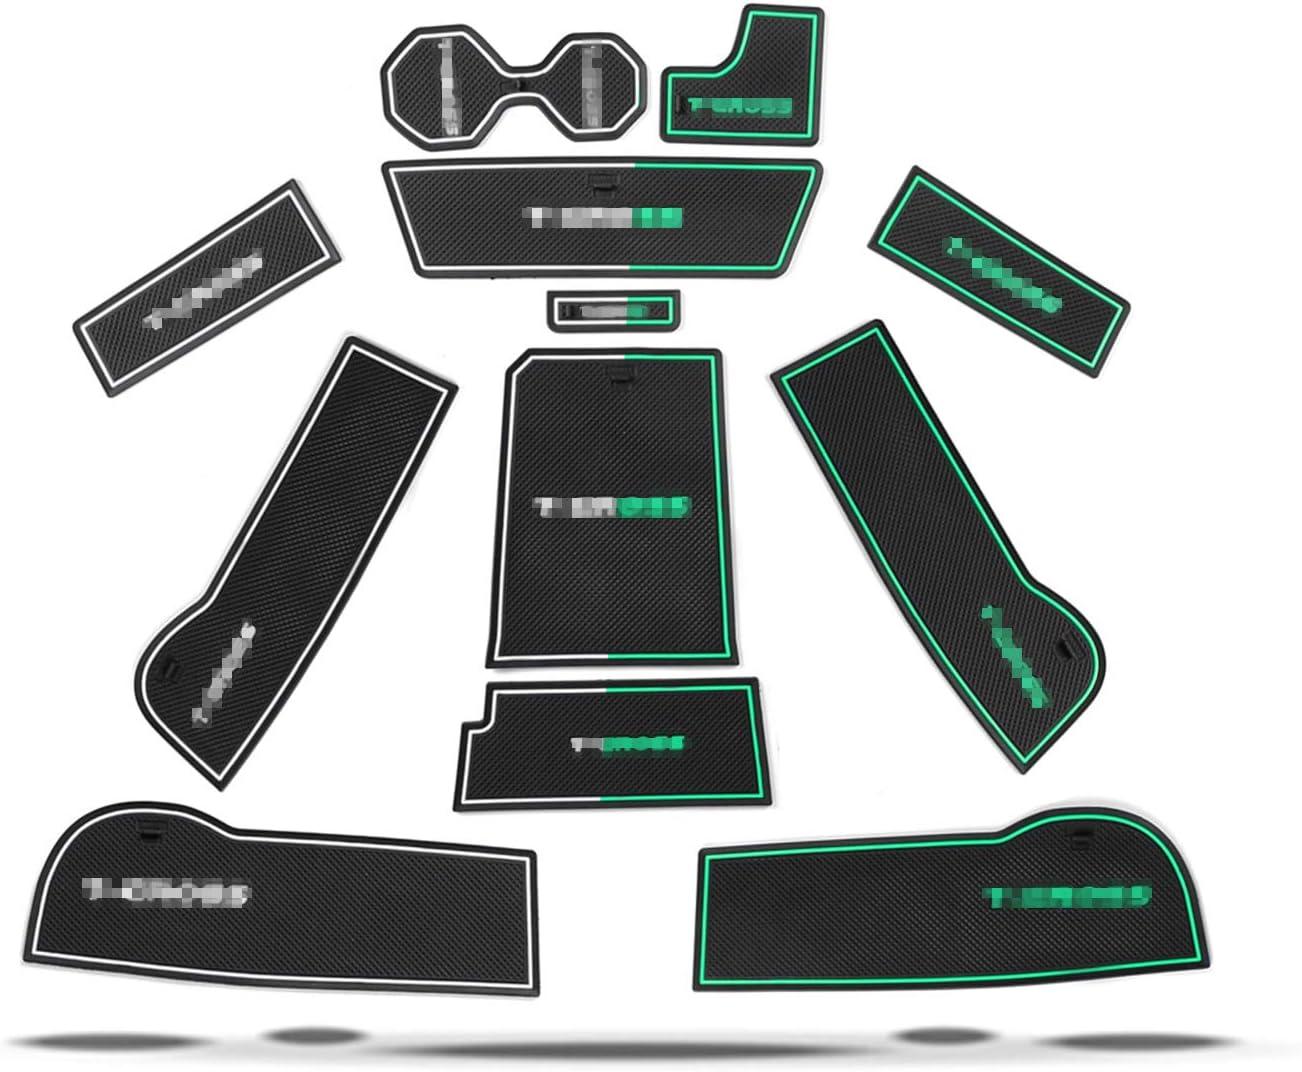 T/ür Becherhalter Slot Matten RUIYA T-Cross Antirutschmatten Wei/ß Auto Innere T/ürschlitz Arm Box Aufbewahrung Matten Pads Gummi Antirutschmatten